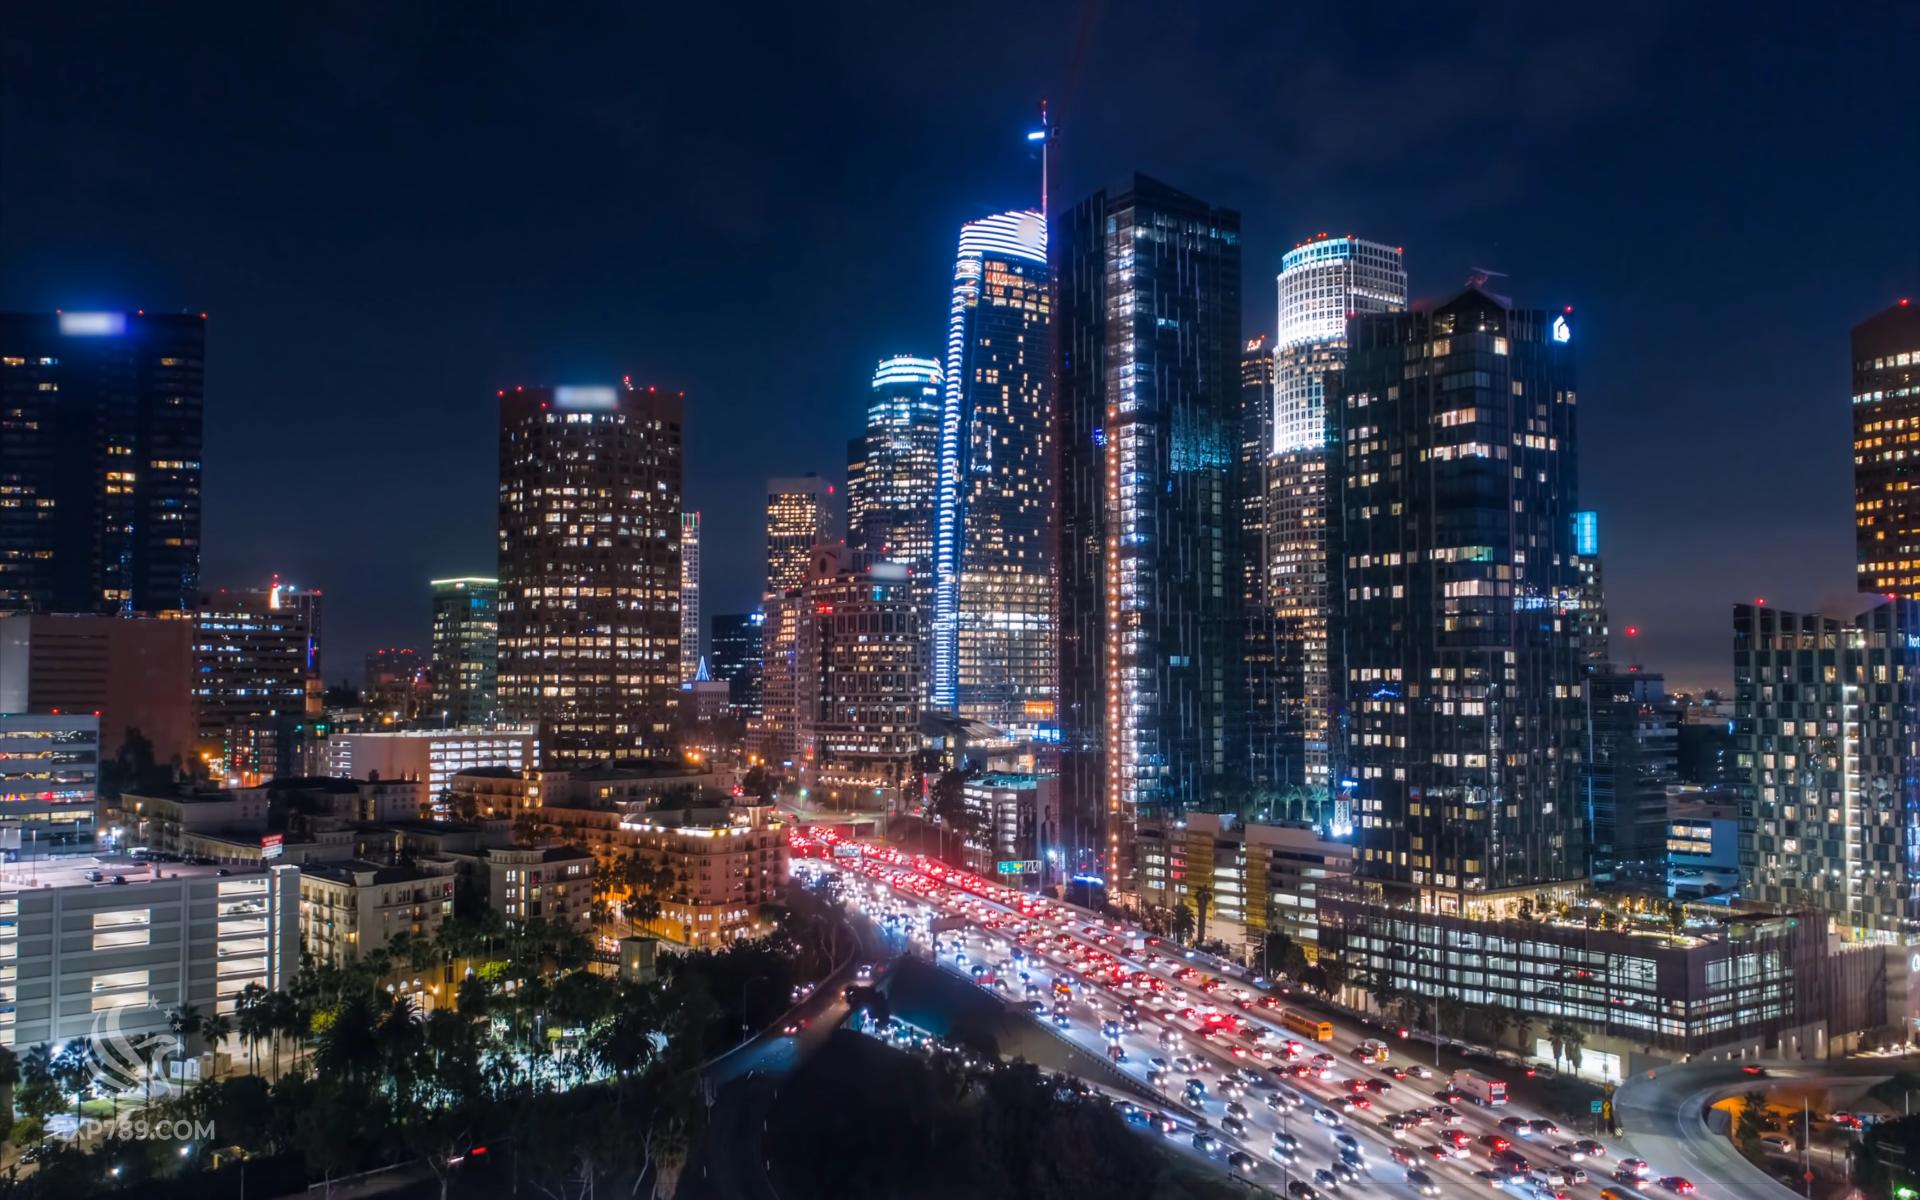 【4K】洛杉矶美丽夜景 无人机航拍 延时摄影